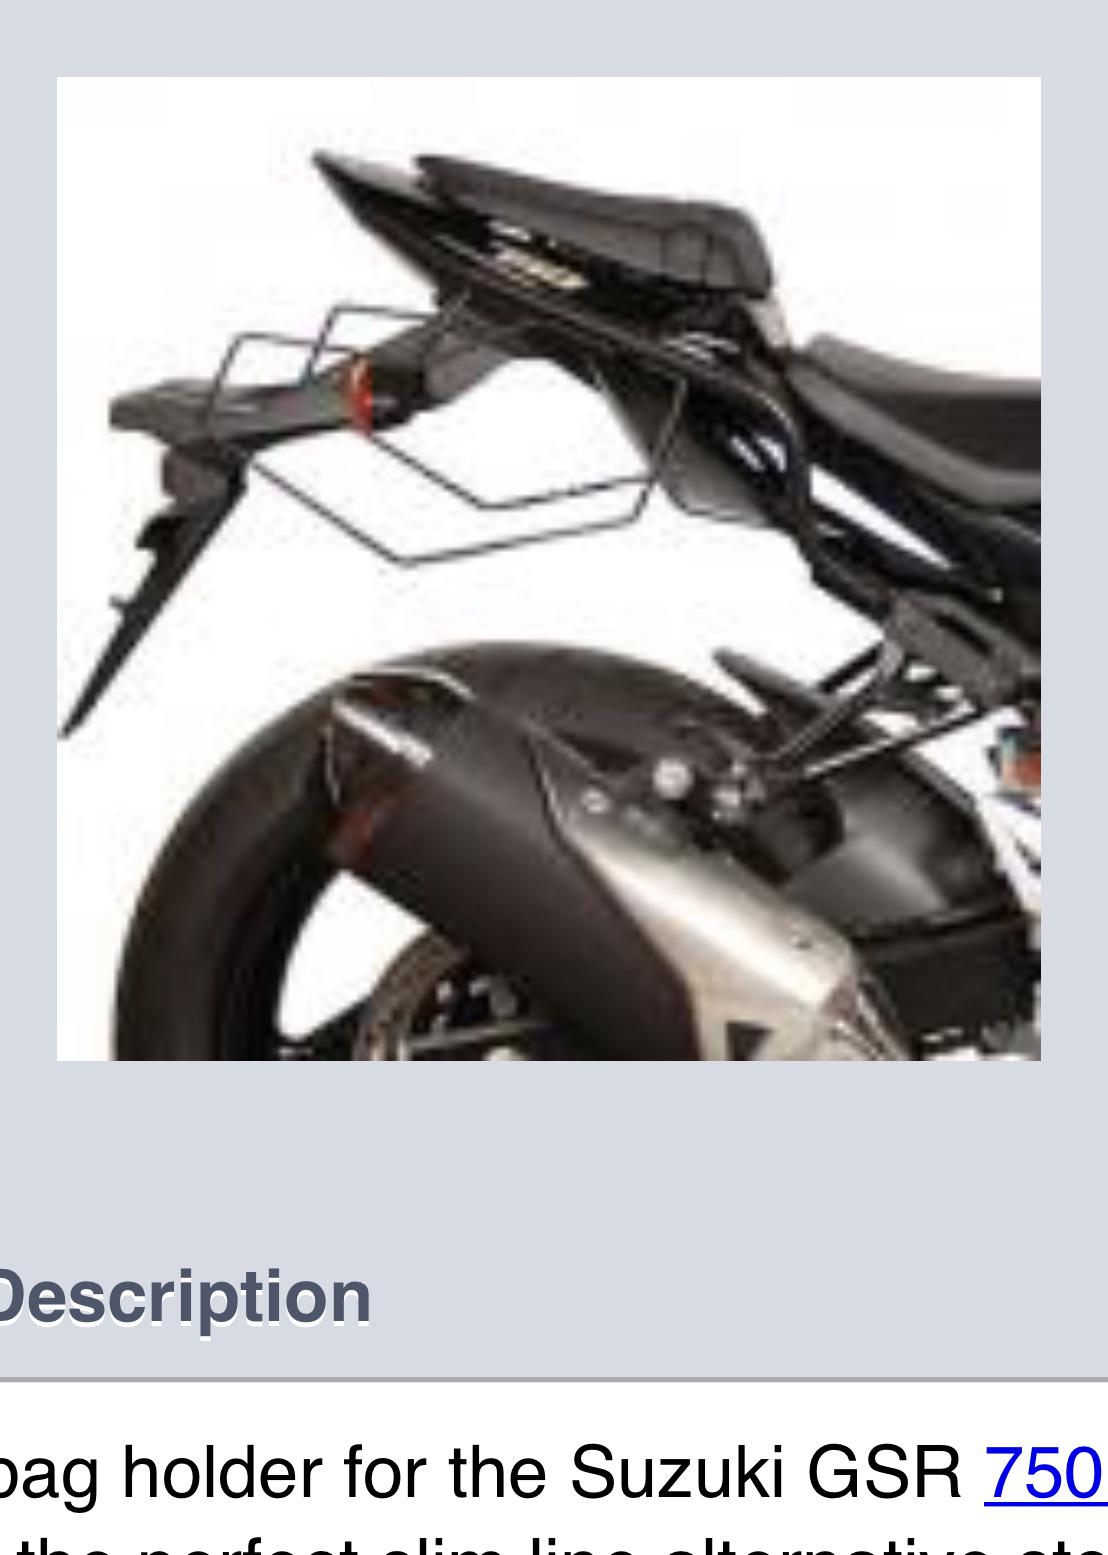 GSR 750 Shad luggage fixing kit - unused for sale-54758db4-df04-42fb-87b1-c486dafd805f.jpeg